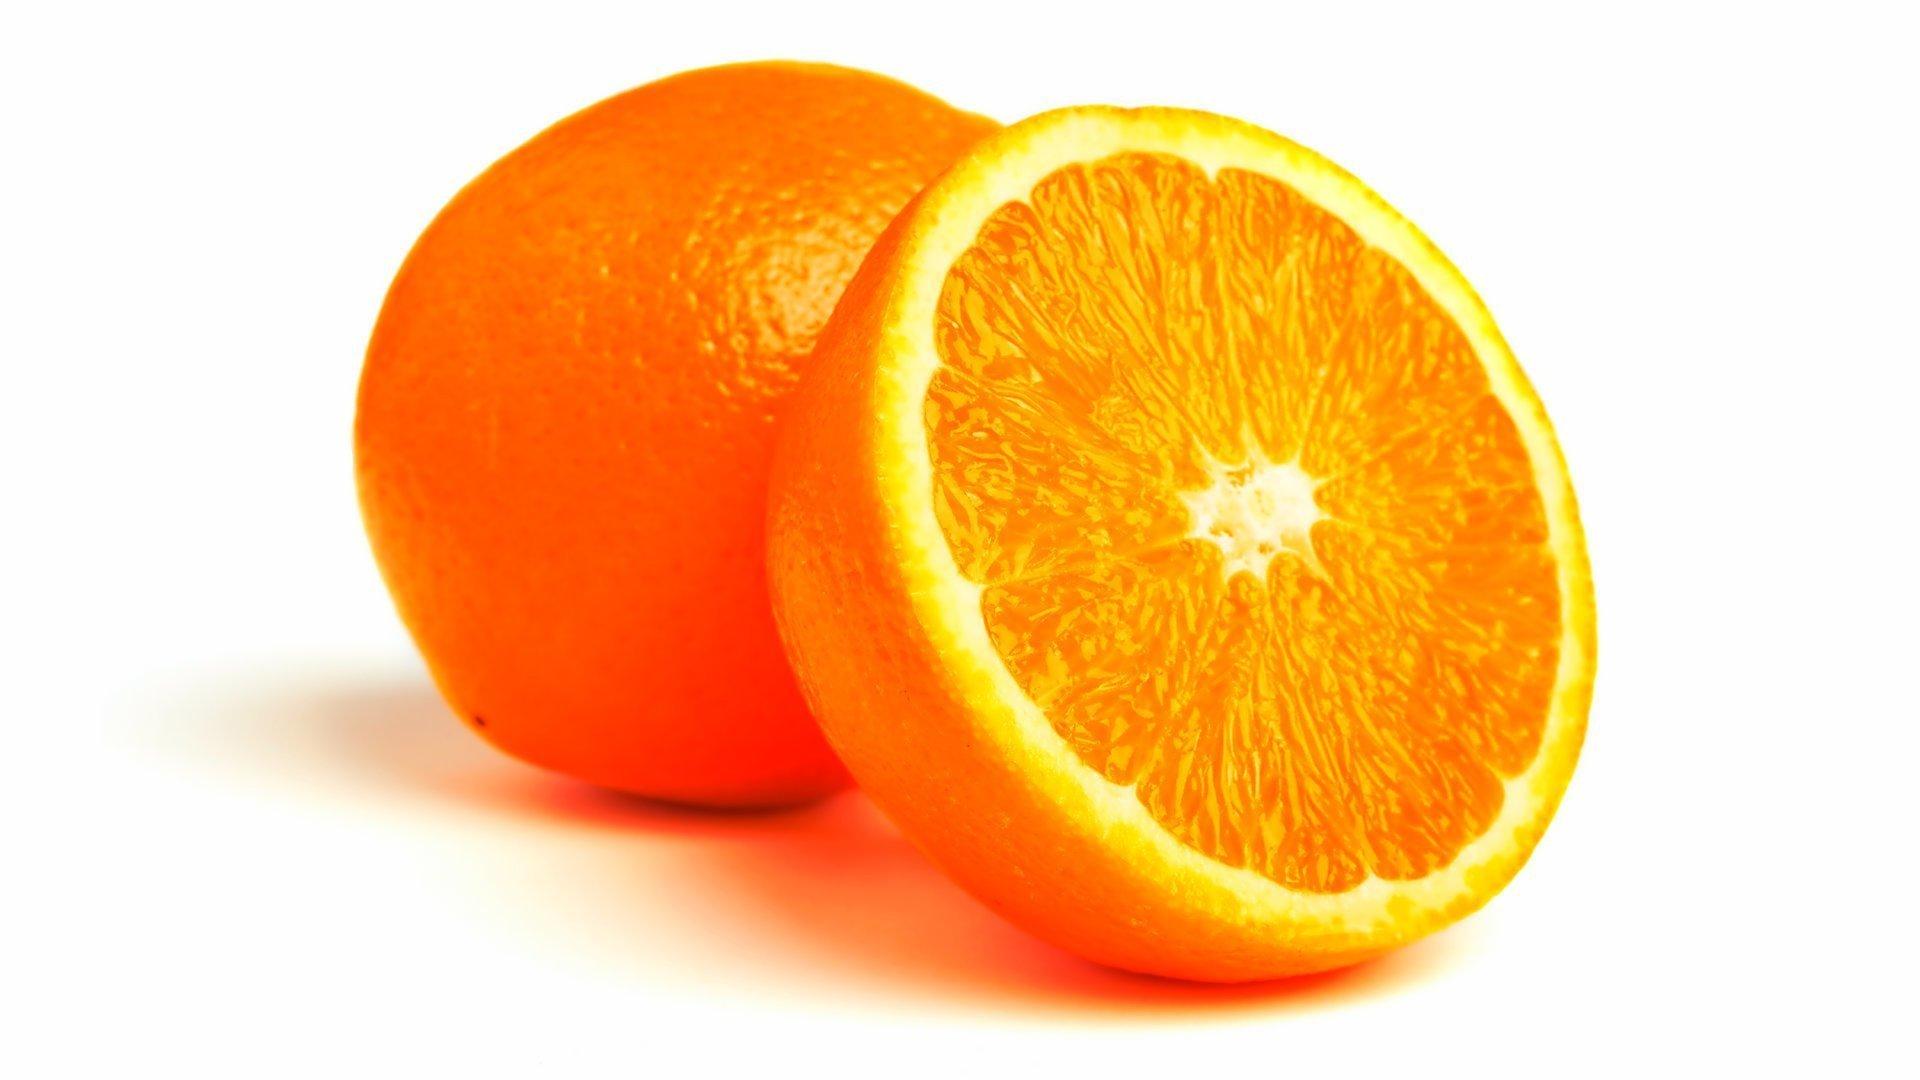 Portakal Arka Planı